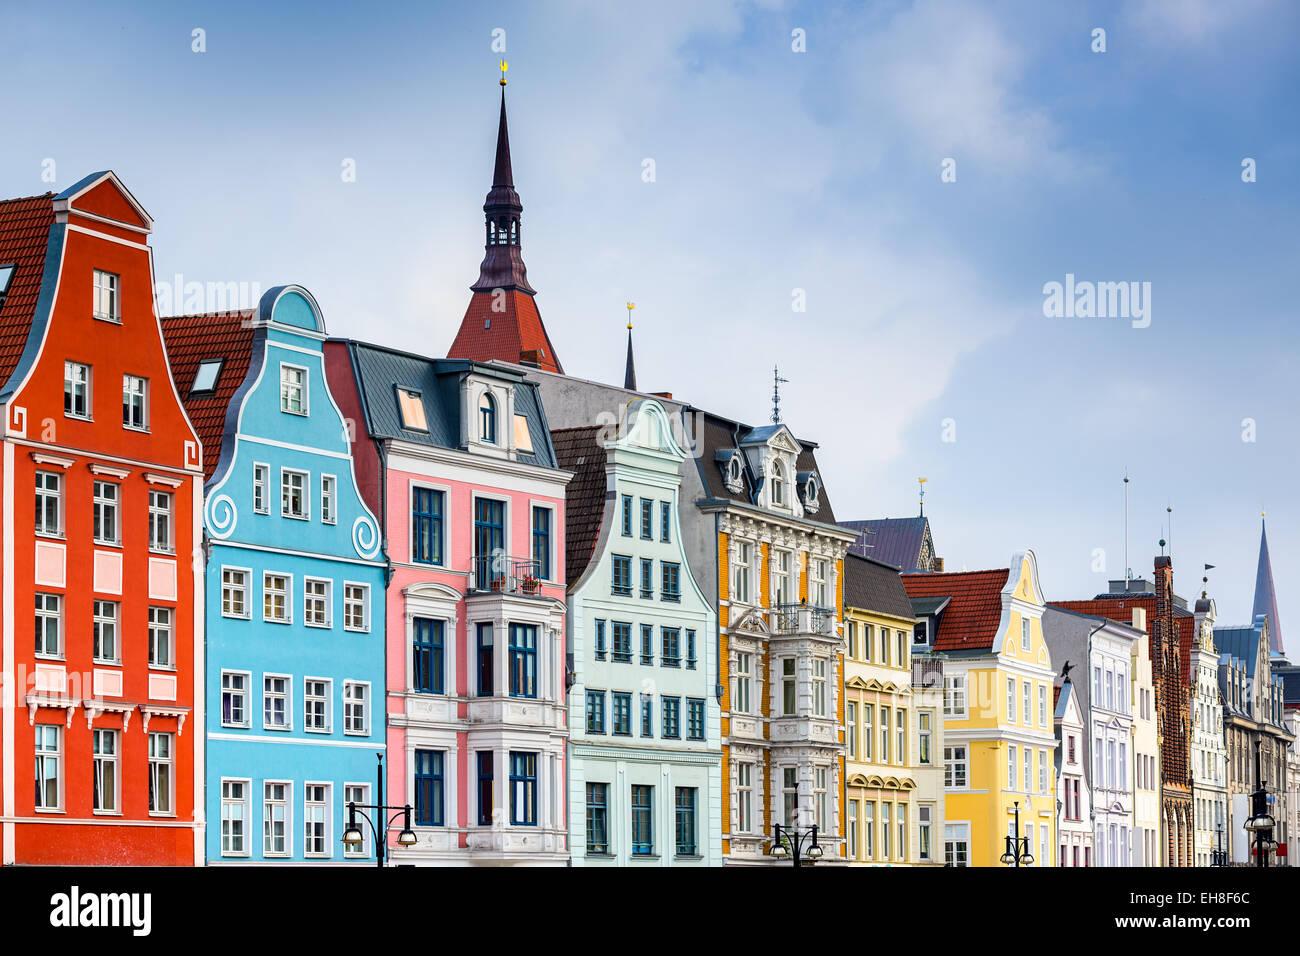 Rostock, Deutschland, alte Stadt Stadtbild. Stockbild